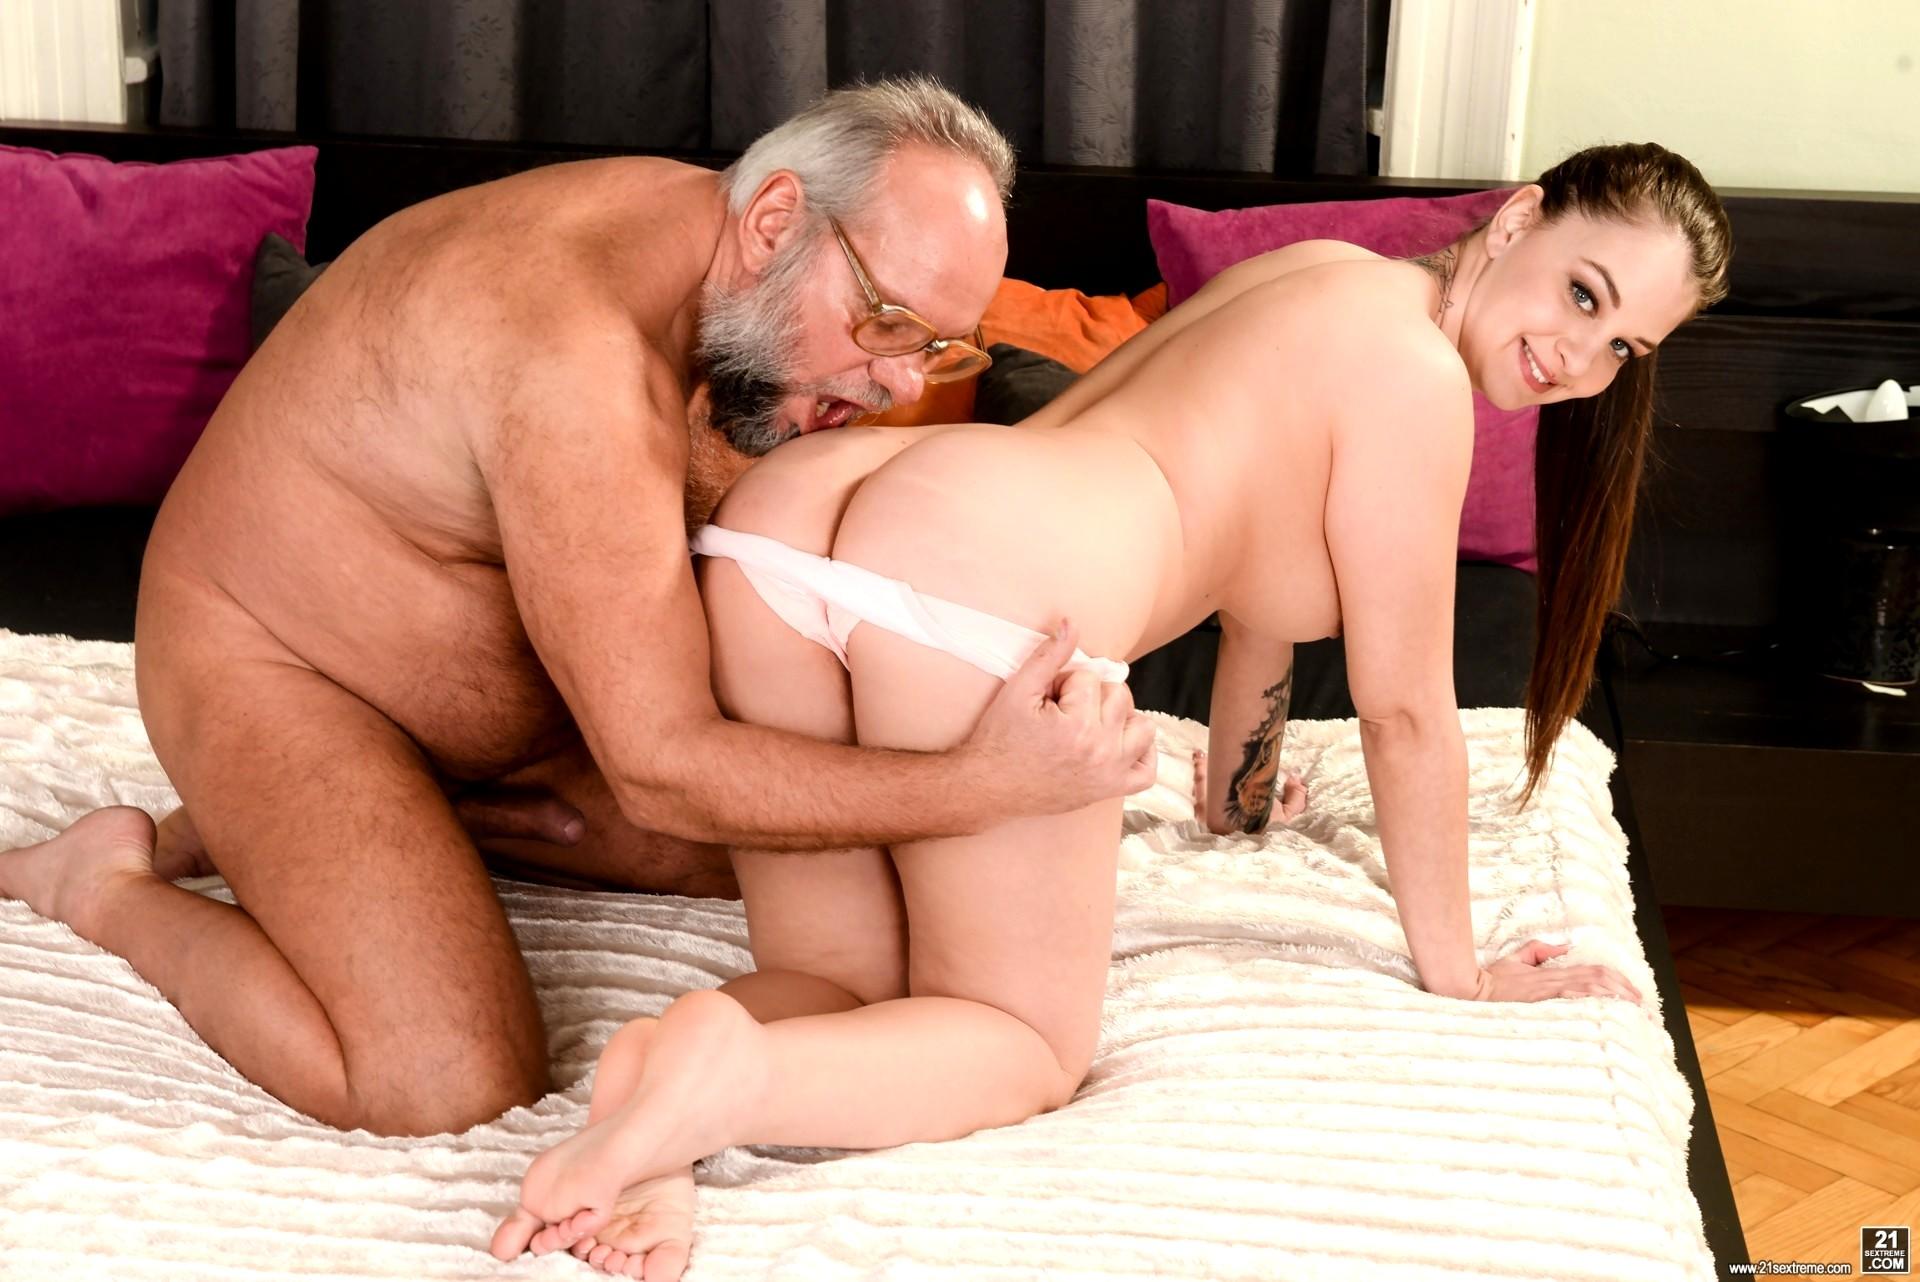 Hottest Old Men Fuck Girl In Hq Porn Pics